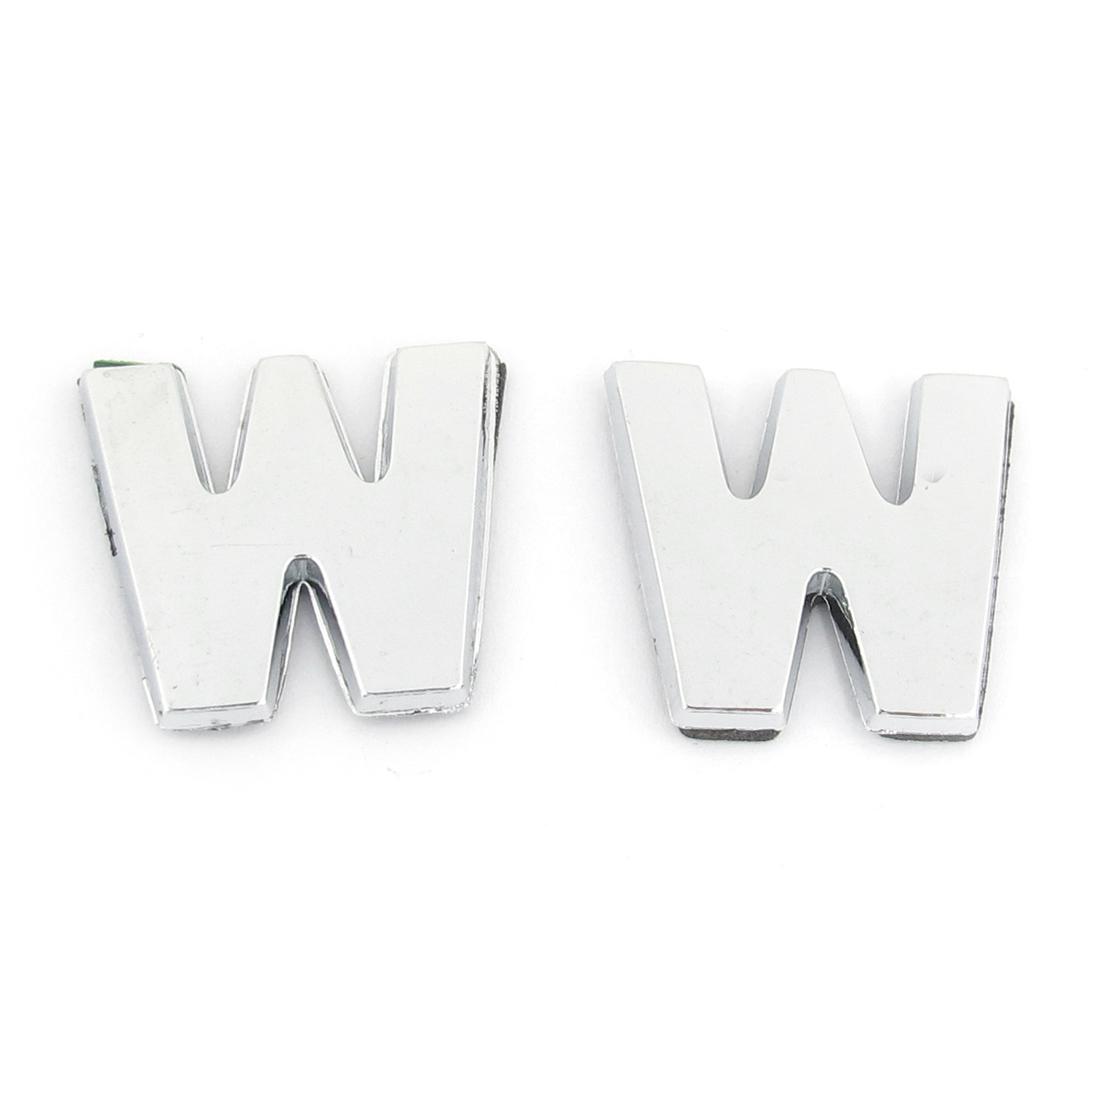 2 Pcs Adhesive Plastic Letter W Car 3D Emblem Sticker Ornament Silver Tone